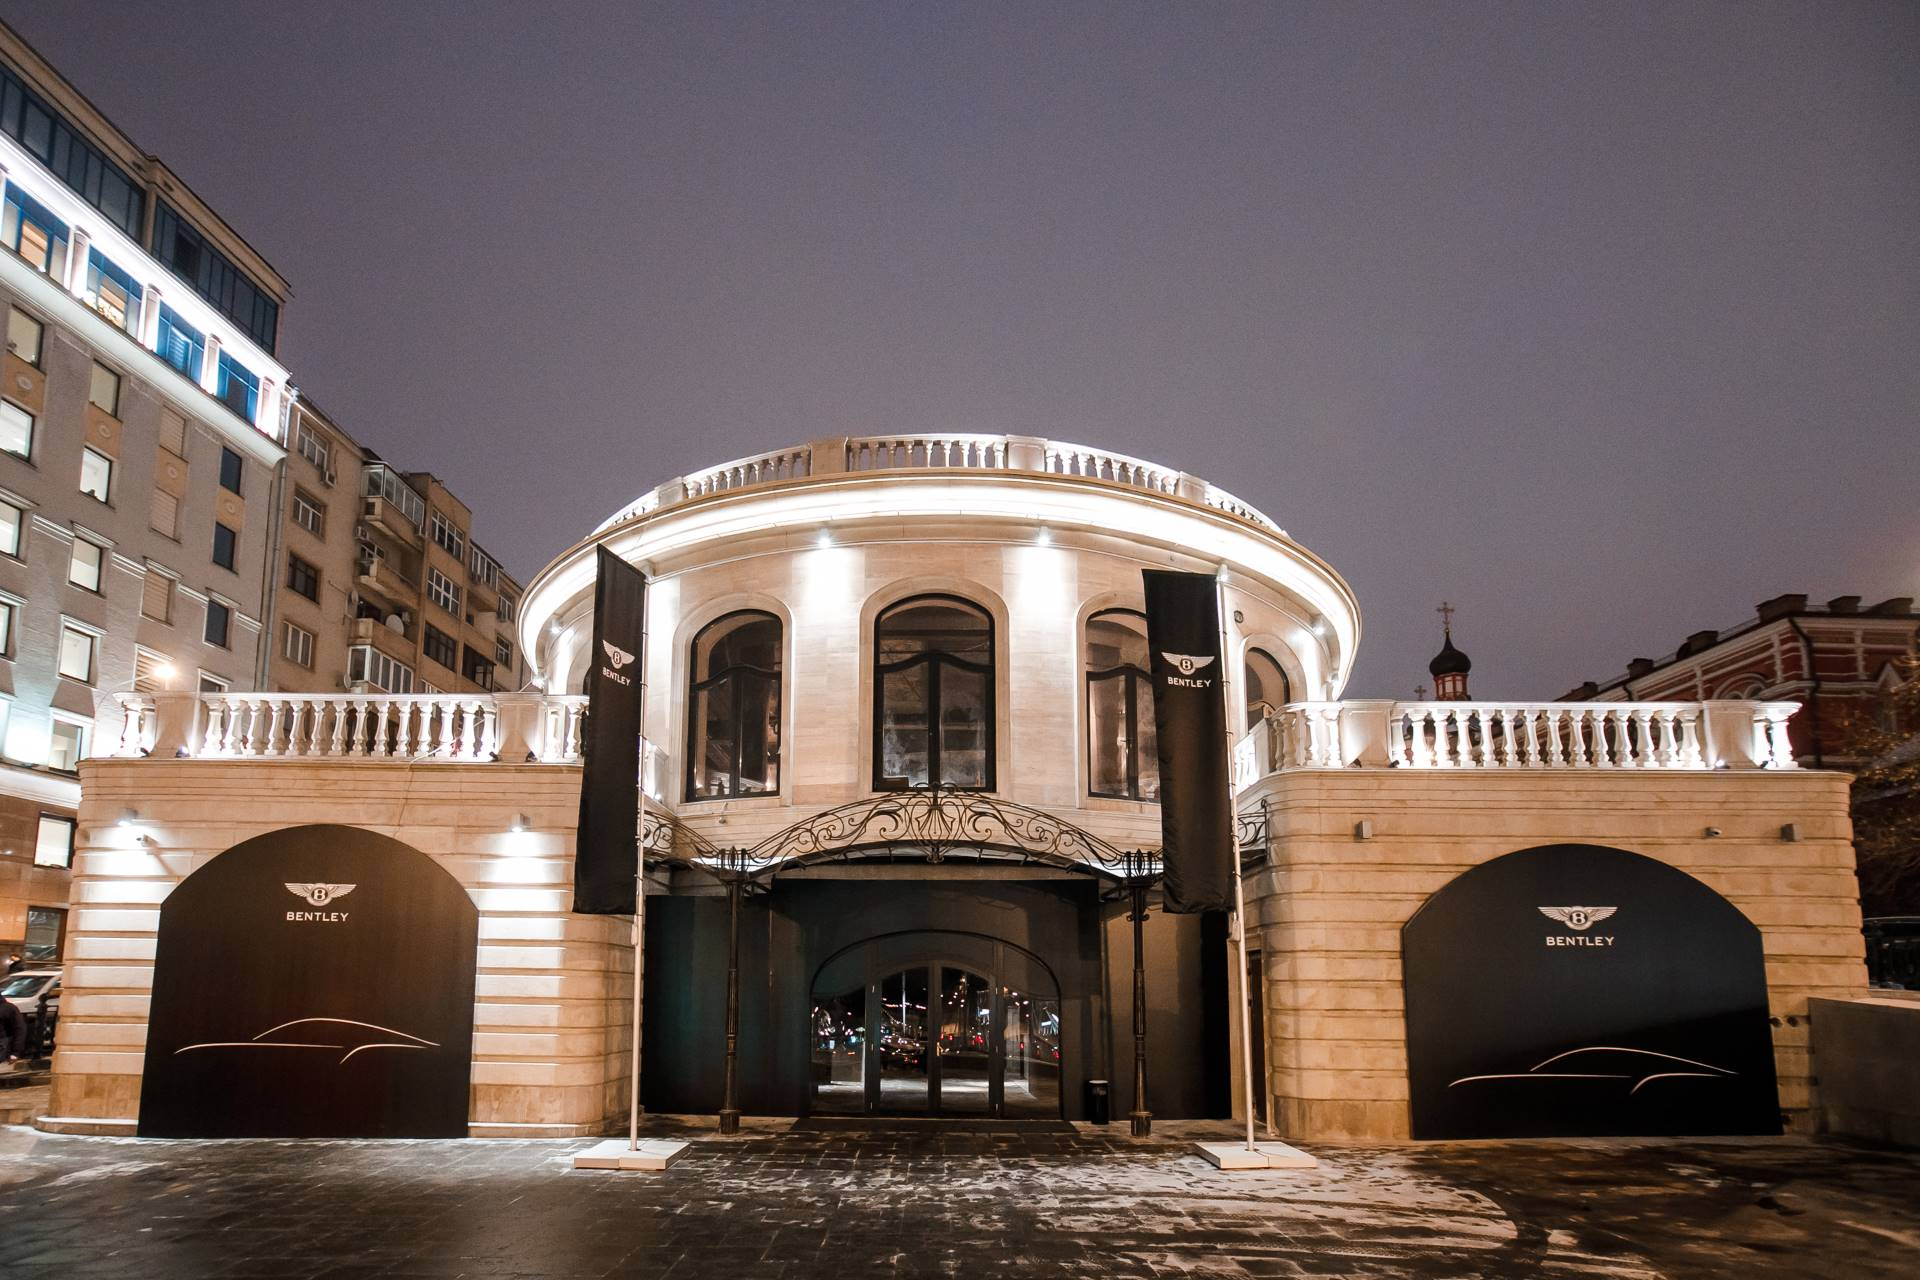 Rozhdestvenka Bazaar